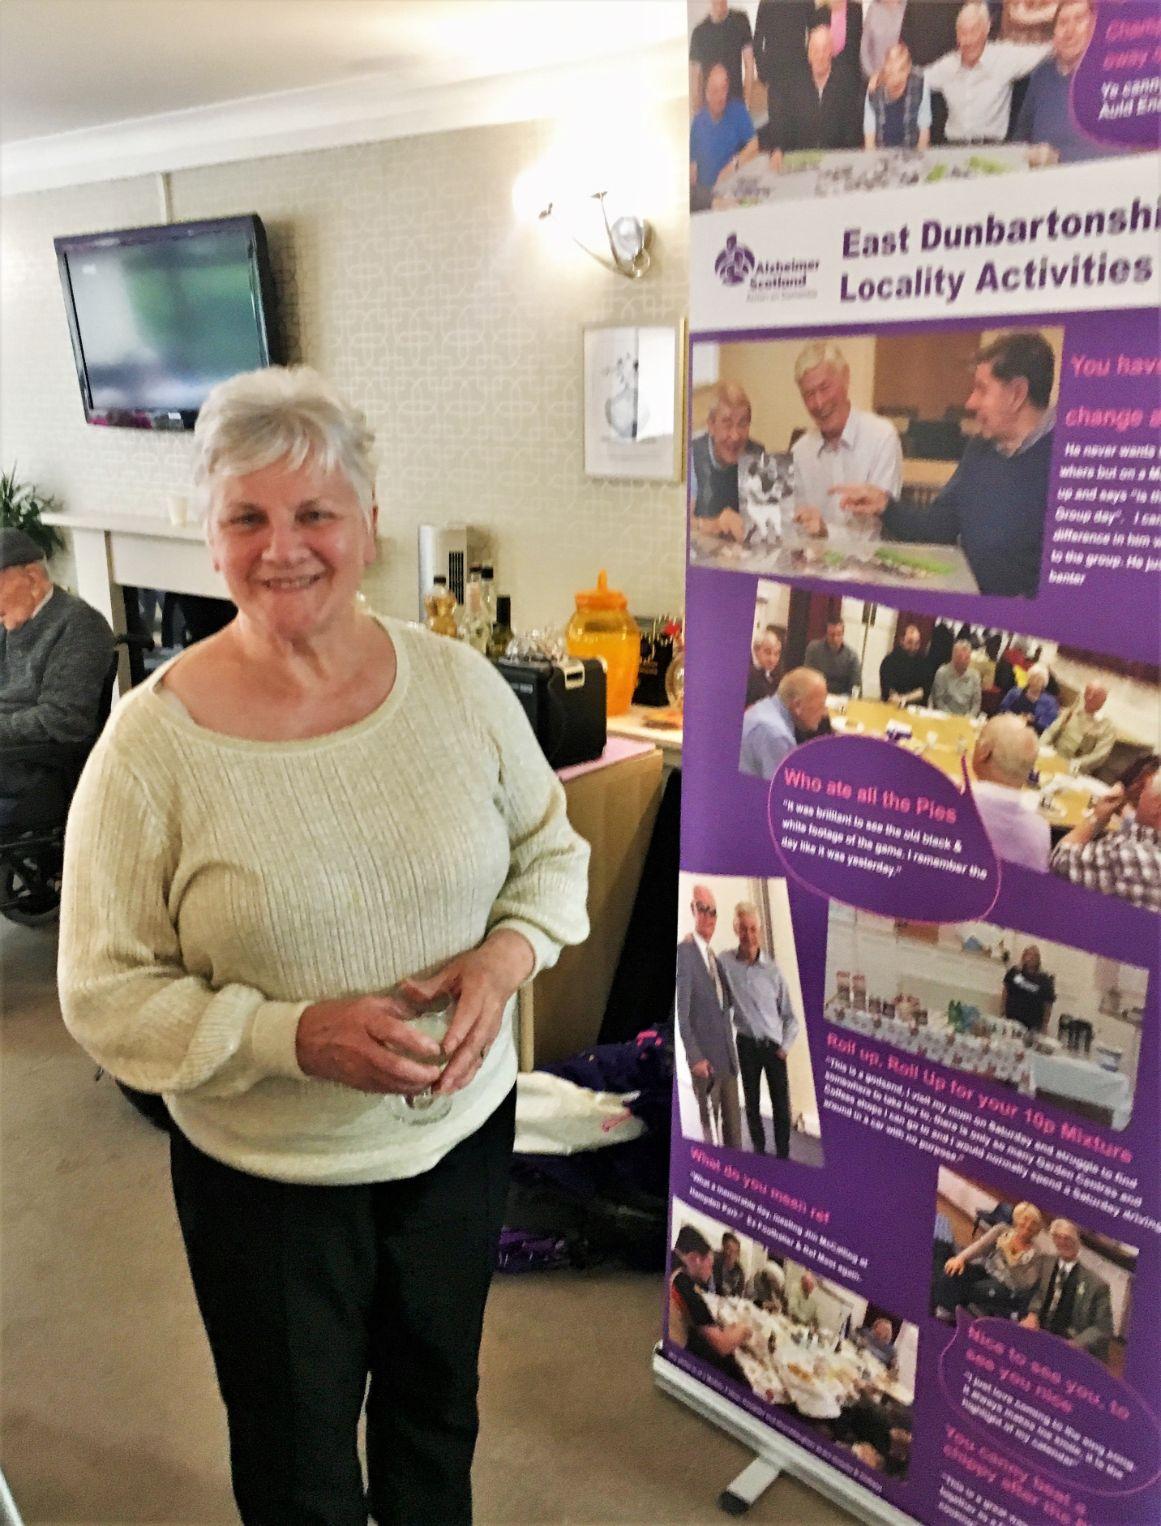 Residents at Buchanan House Care Home in Bearsden take part in karaoke for Dementia Awareness Week Scotland